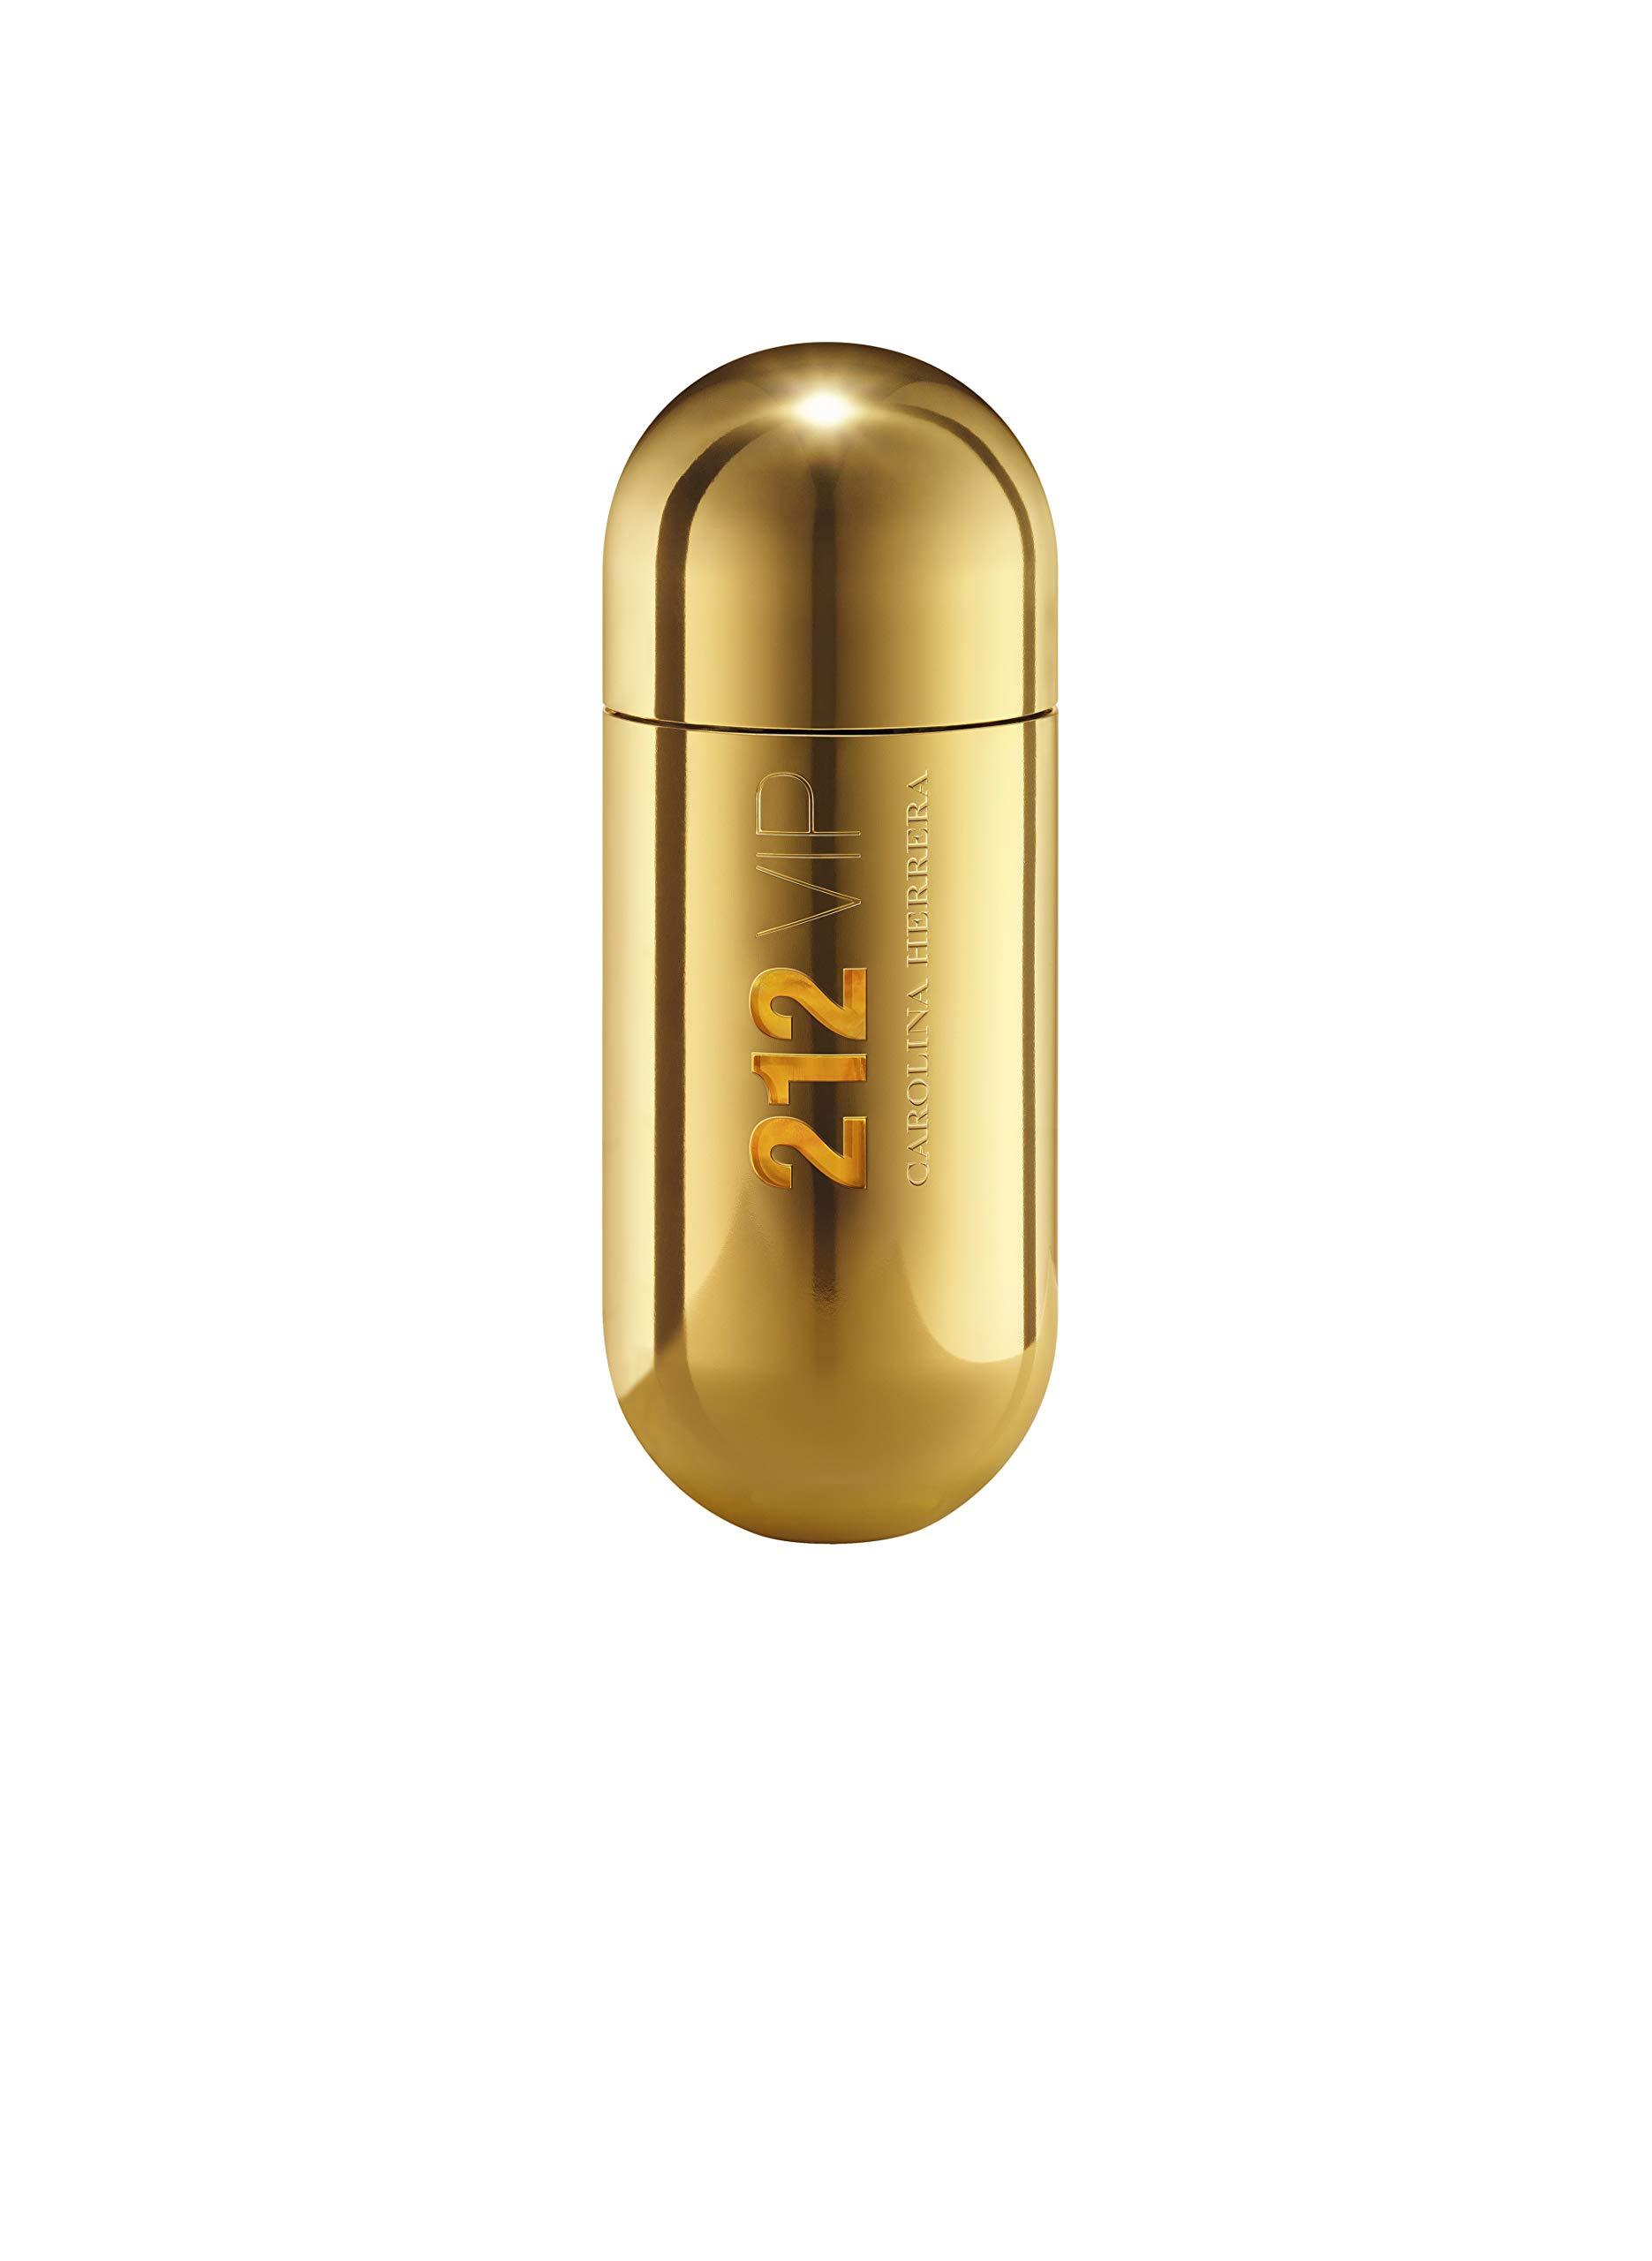 Carolina Herrera Ch Sublime Eau De Parfum Spray For Women Edp 80ml 212 Vip By 270 Ounce